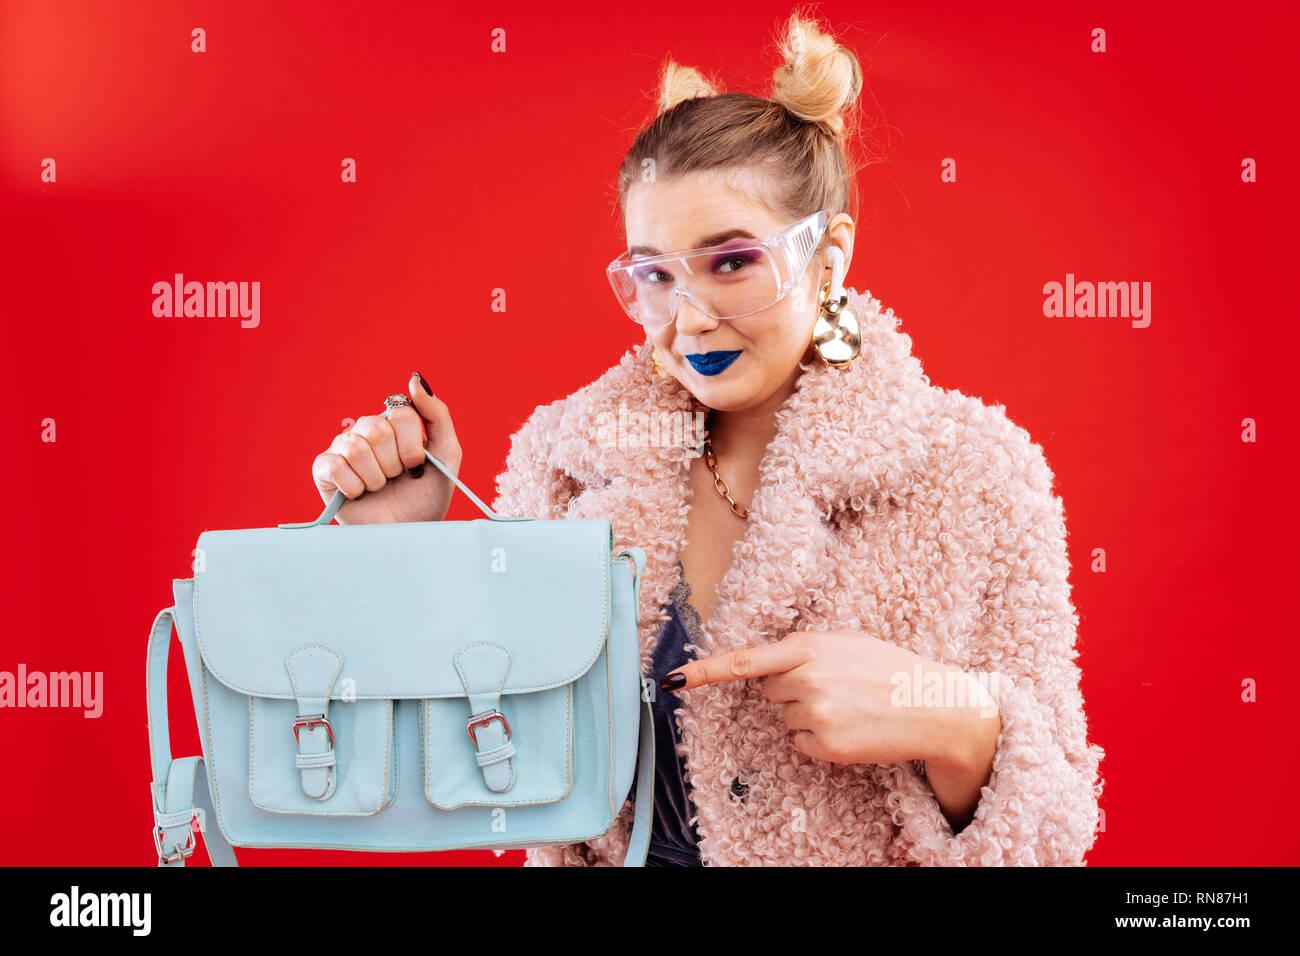 Shopaholic with makeup feeling amazing after buying new bag - Stock Image